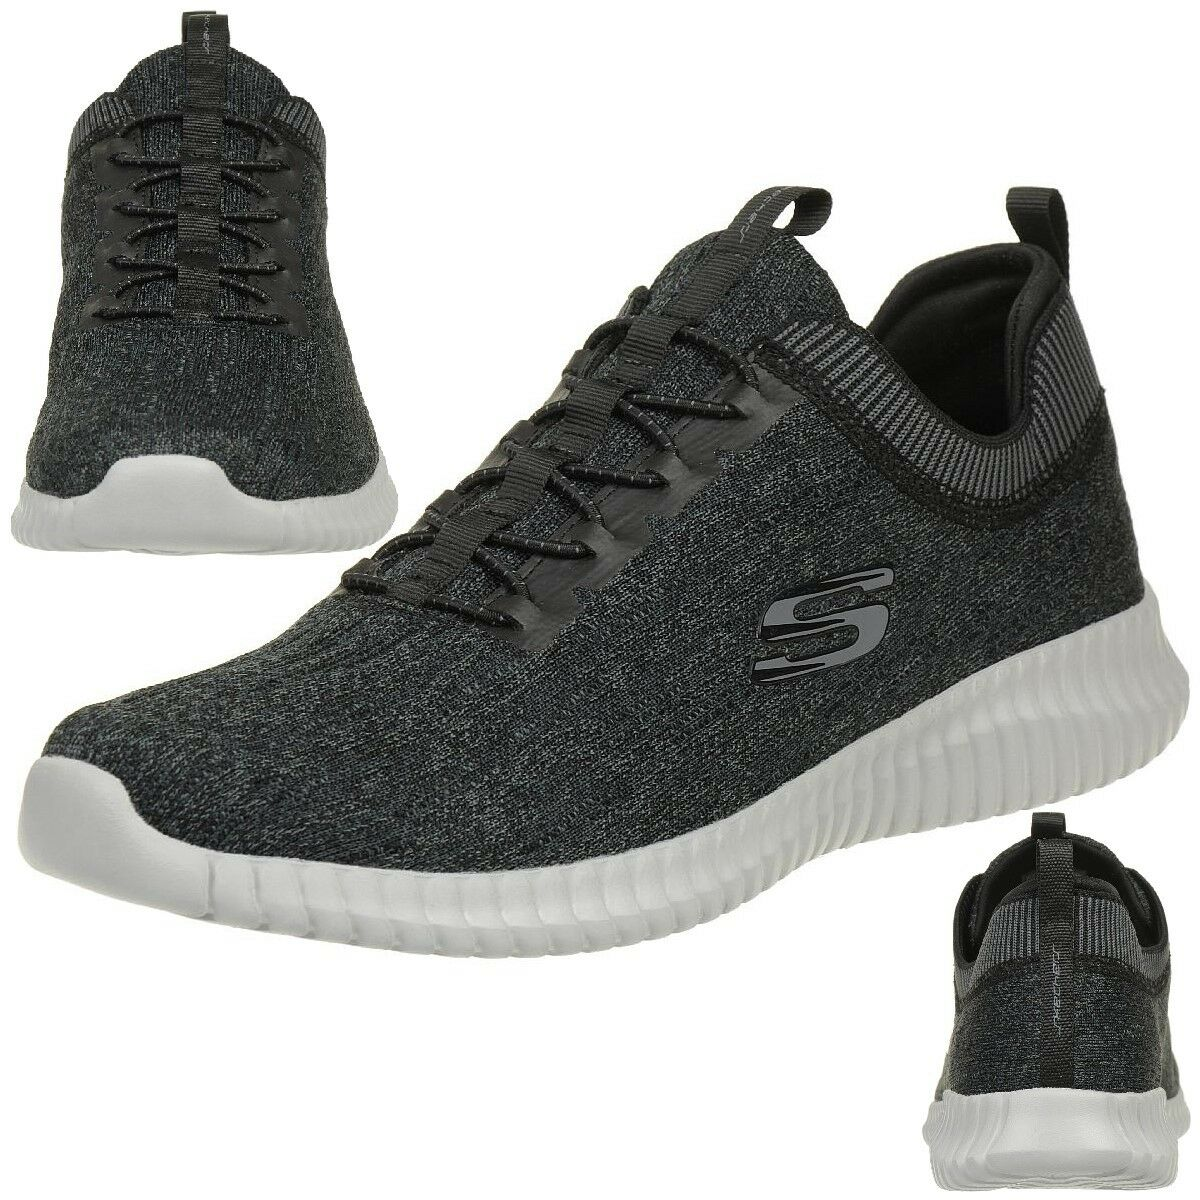 sketchers élite bkgy hommes flex hartnell chaussures bkgy élite baskets fitness 219ff5